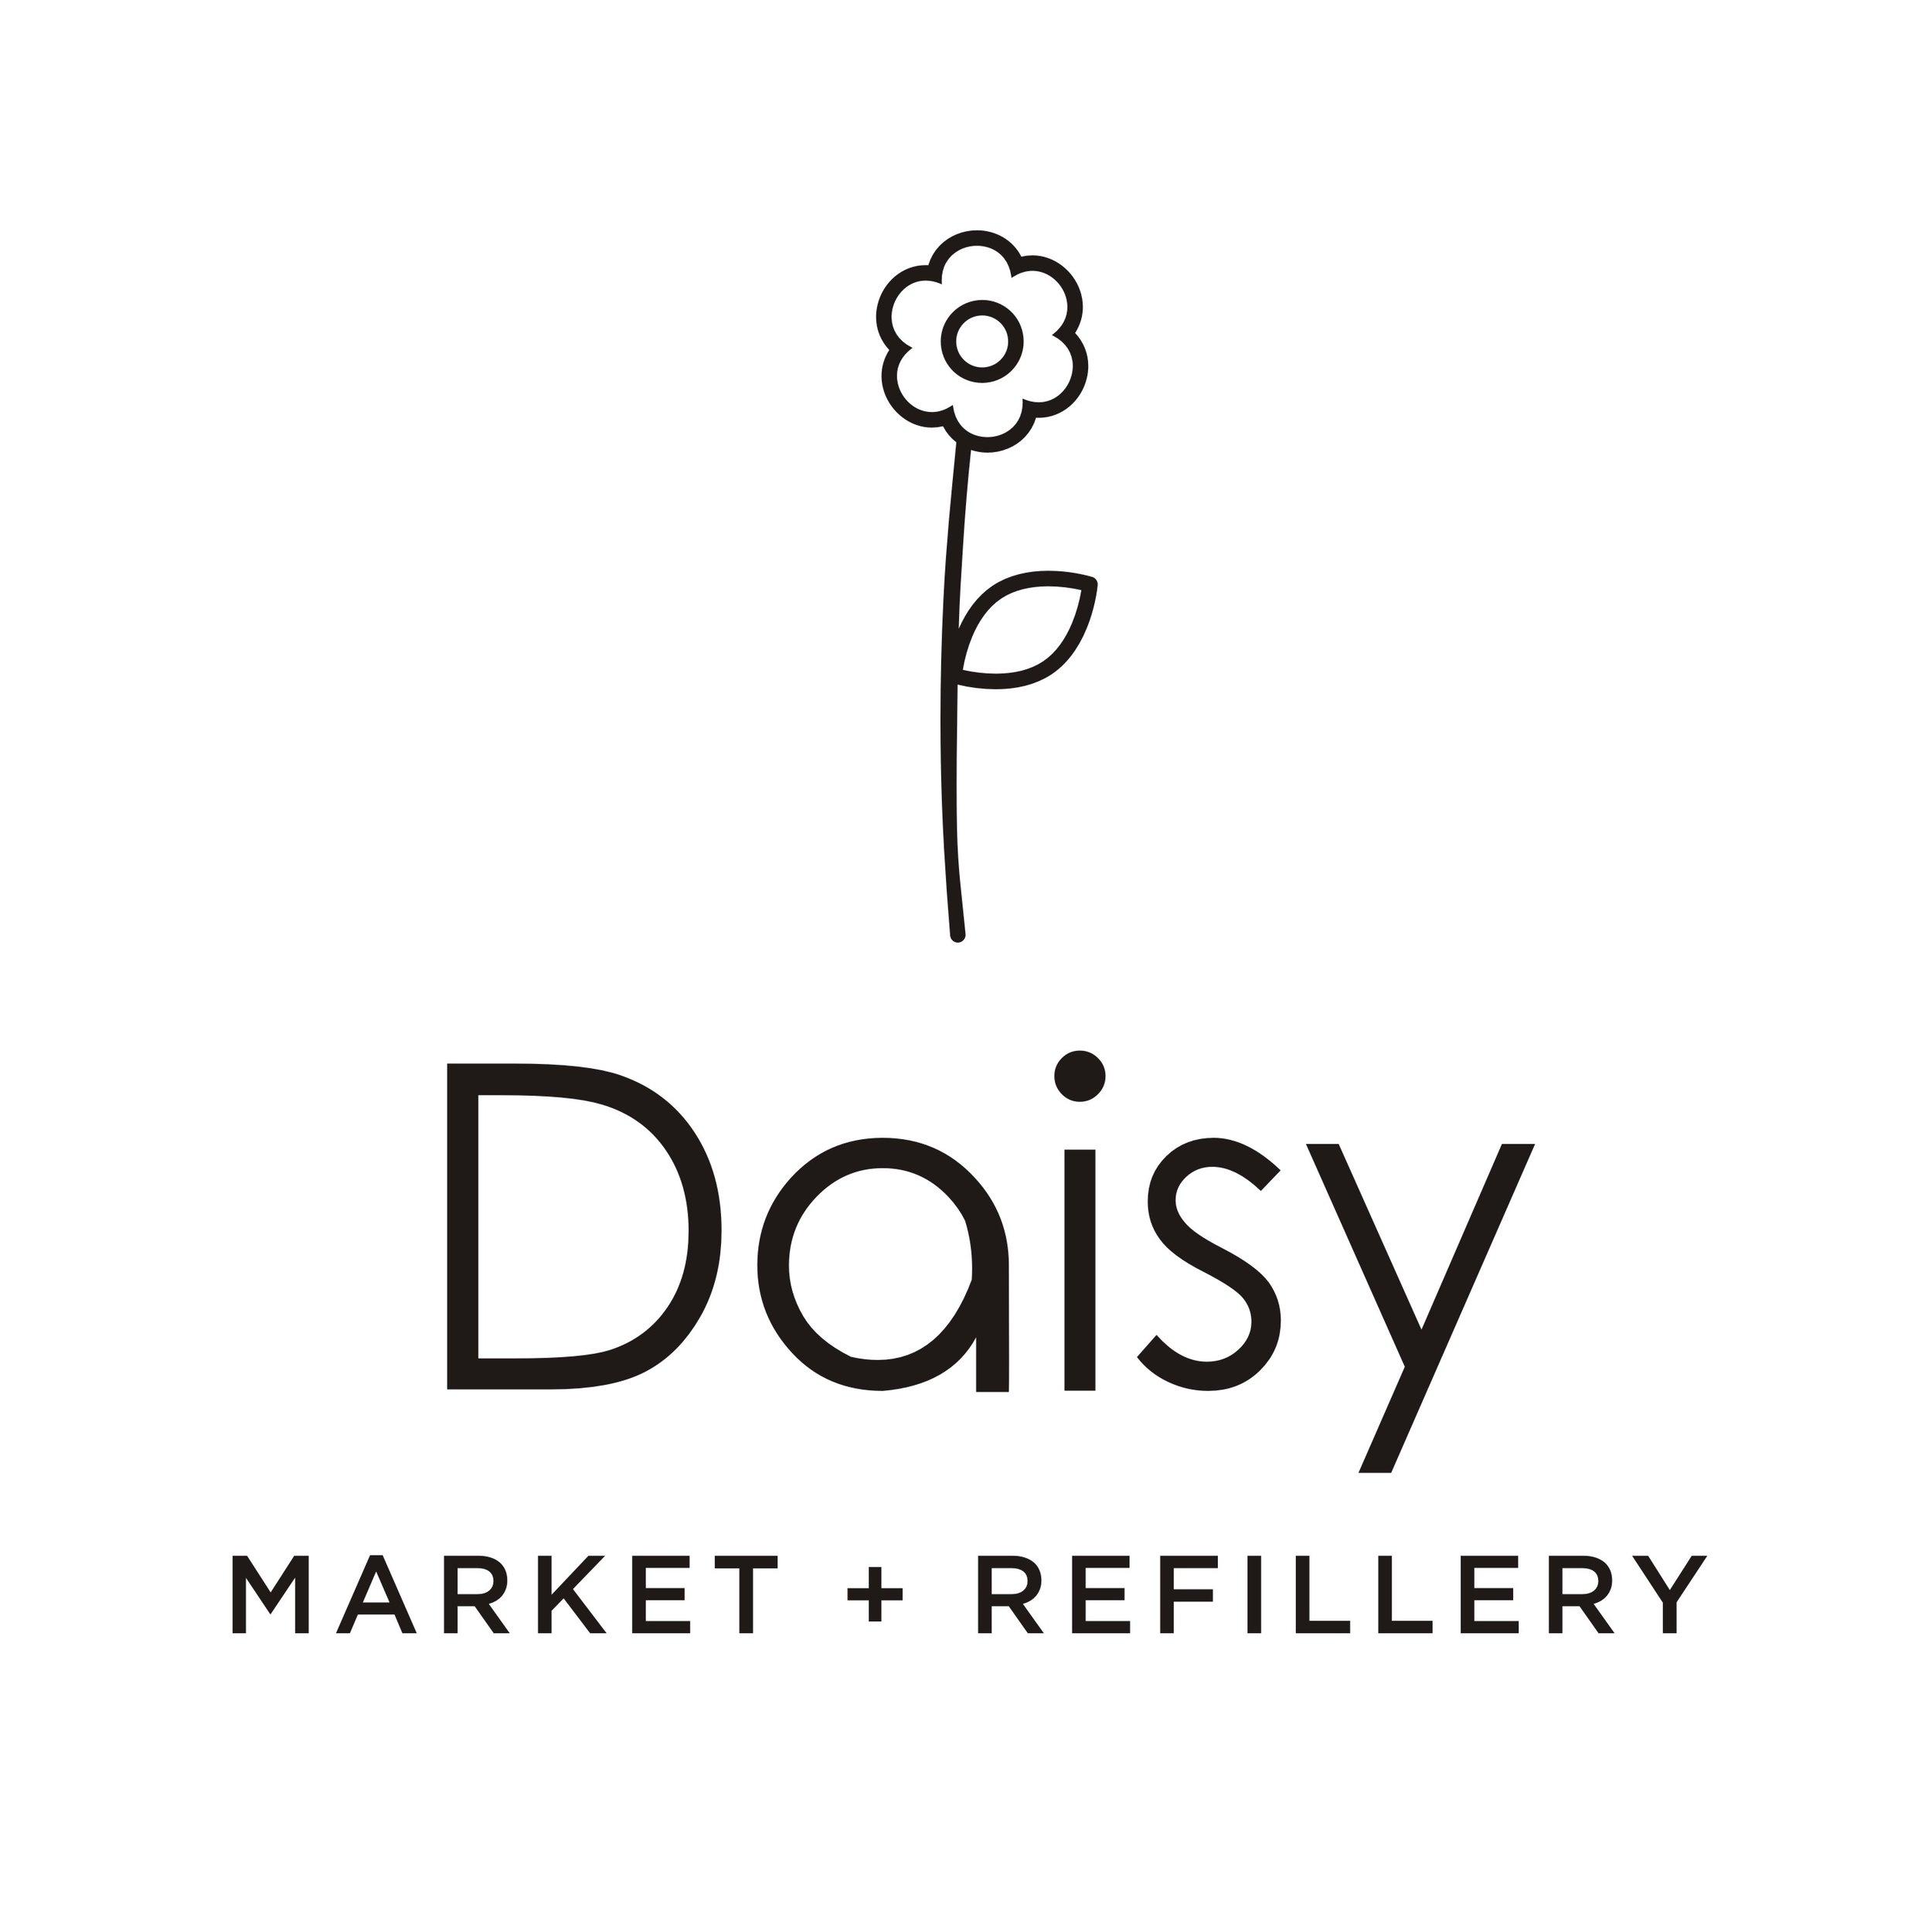 Daisy Market - logo (black on white).JPG